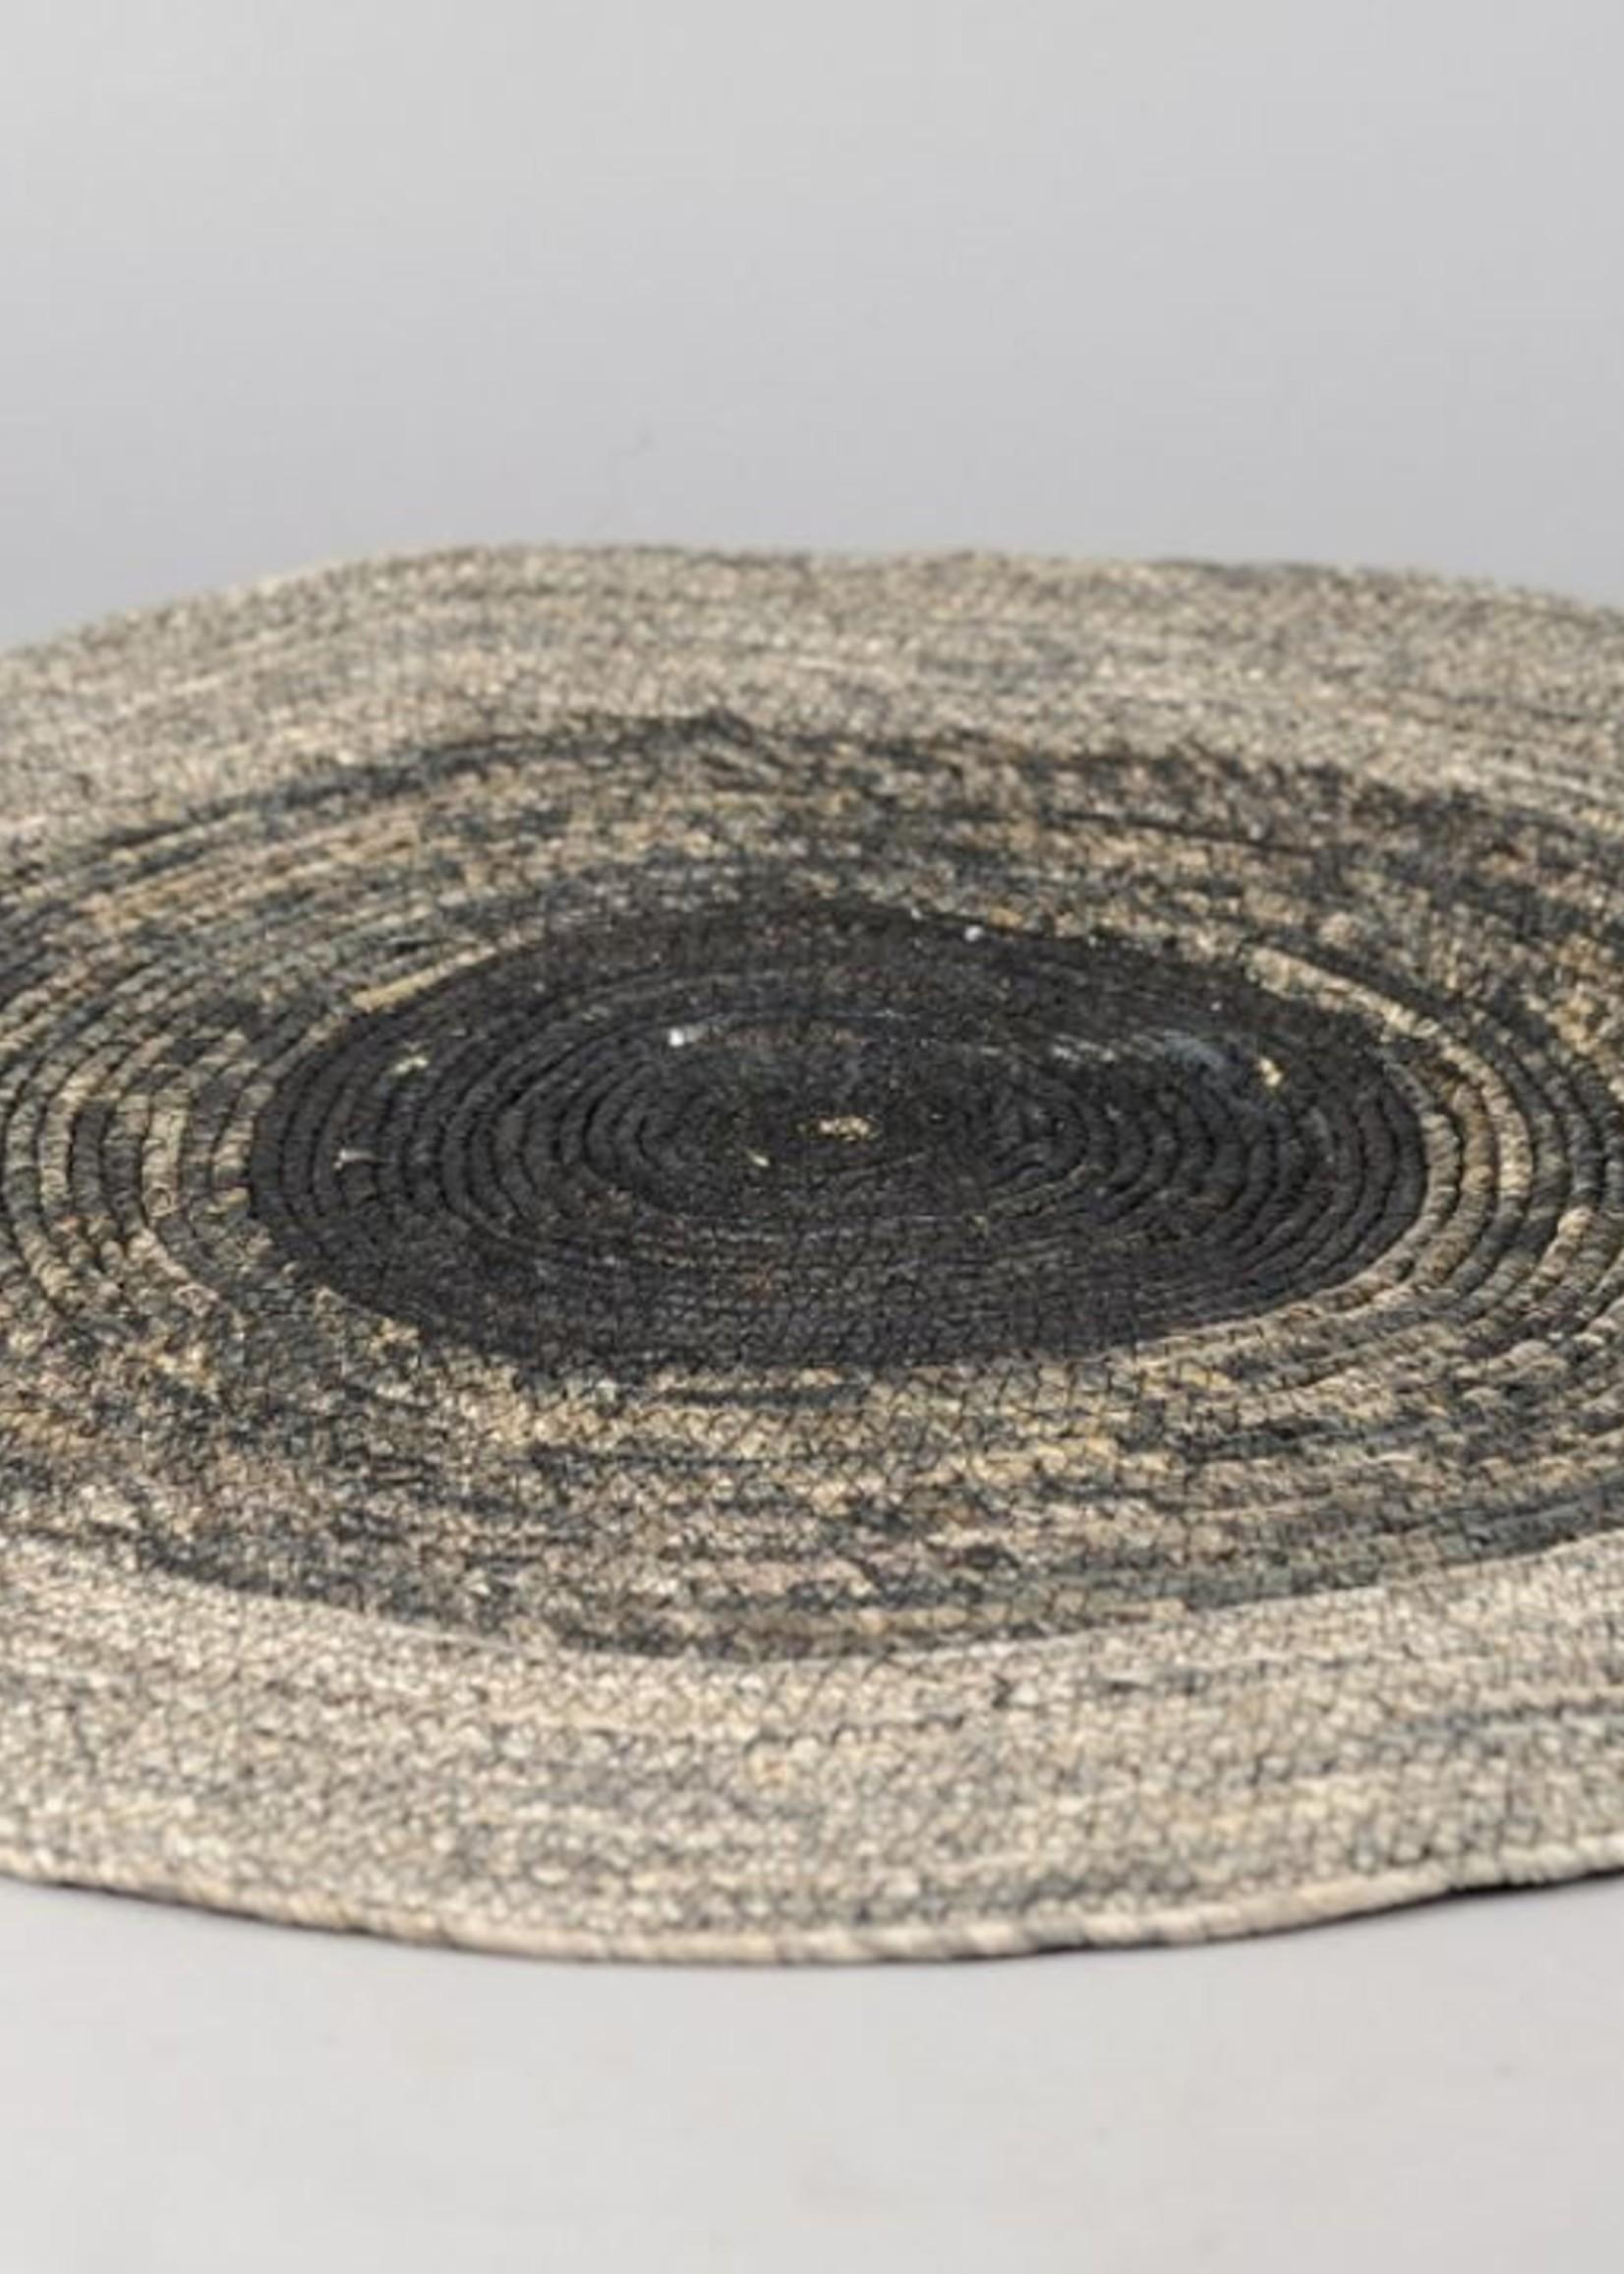 RASTELI tapijt riet